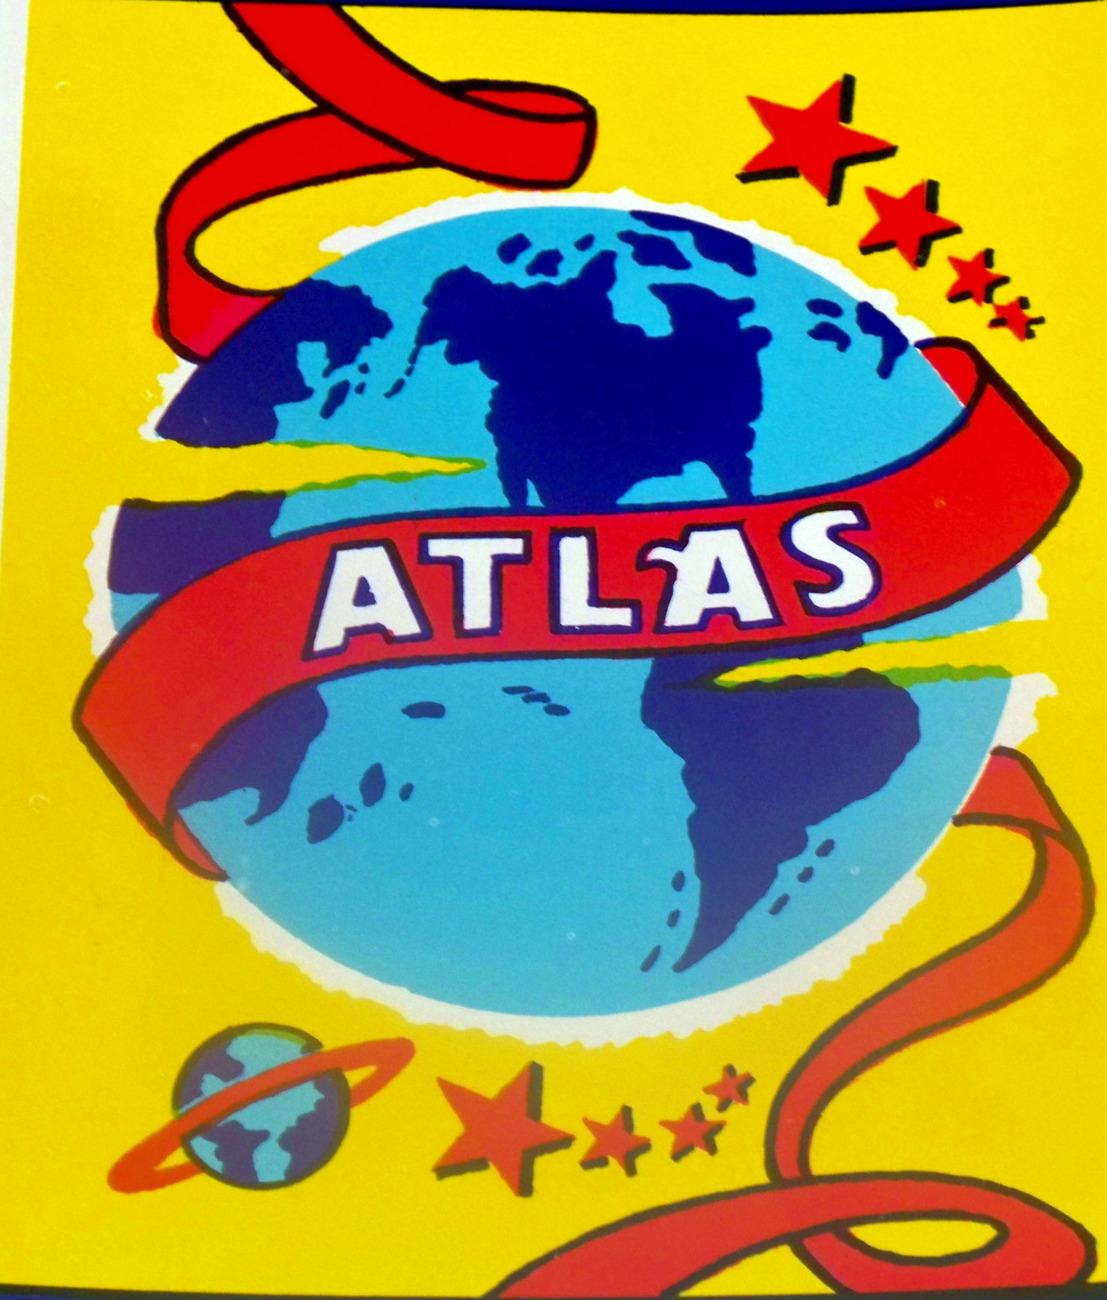 Atlas broom label 002